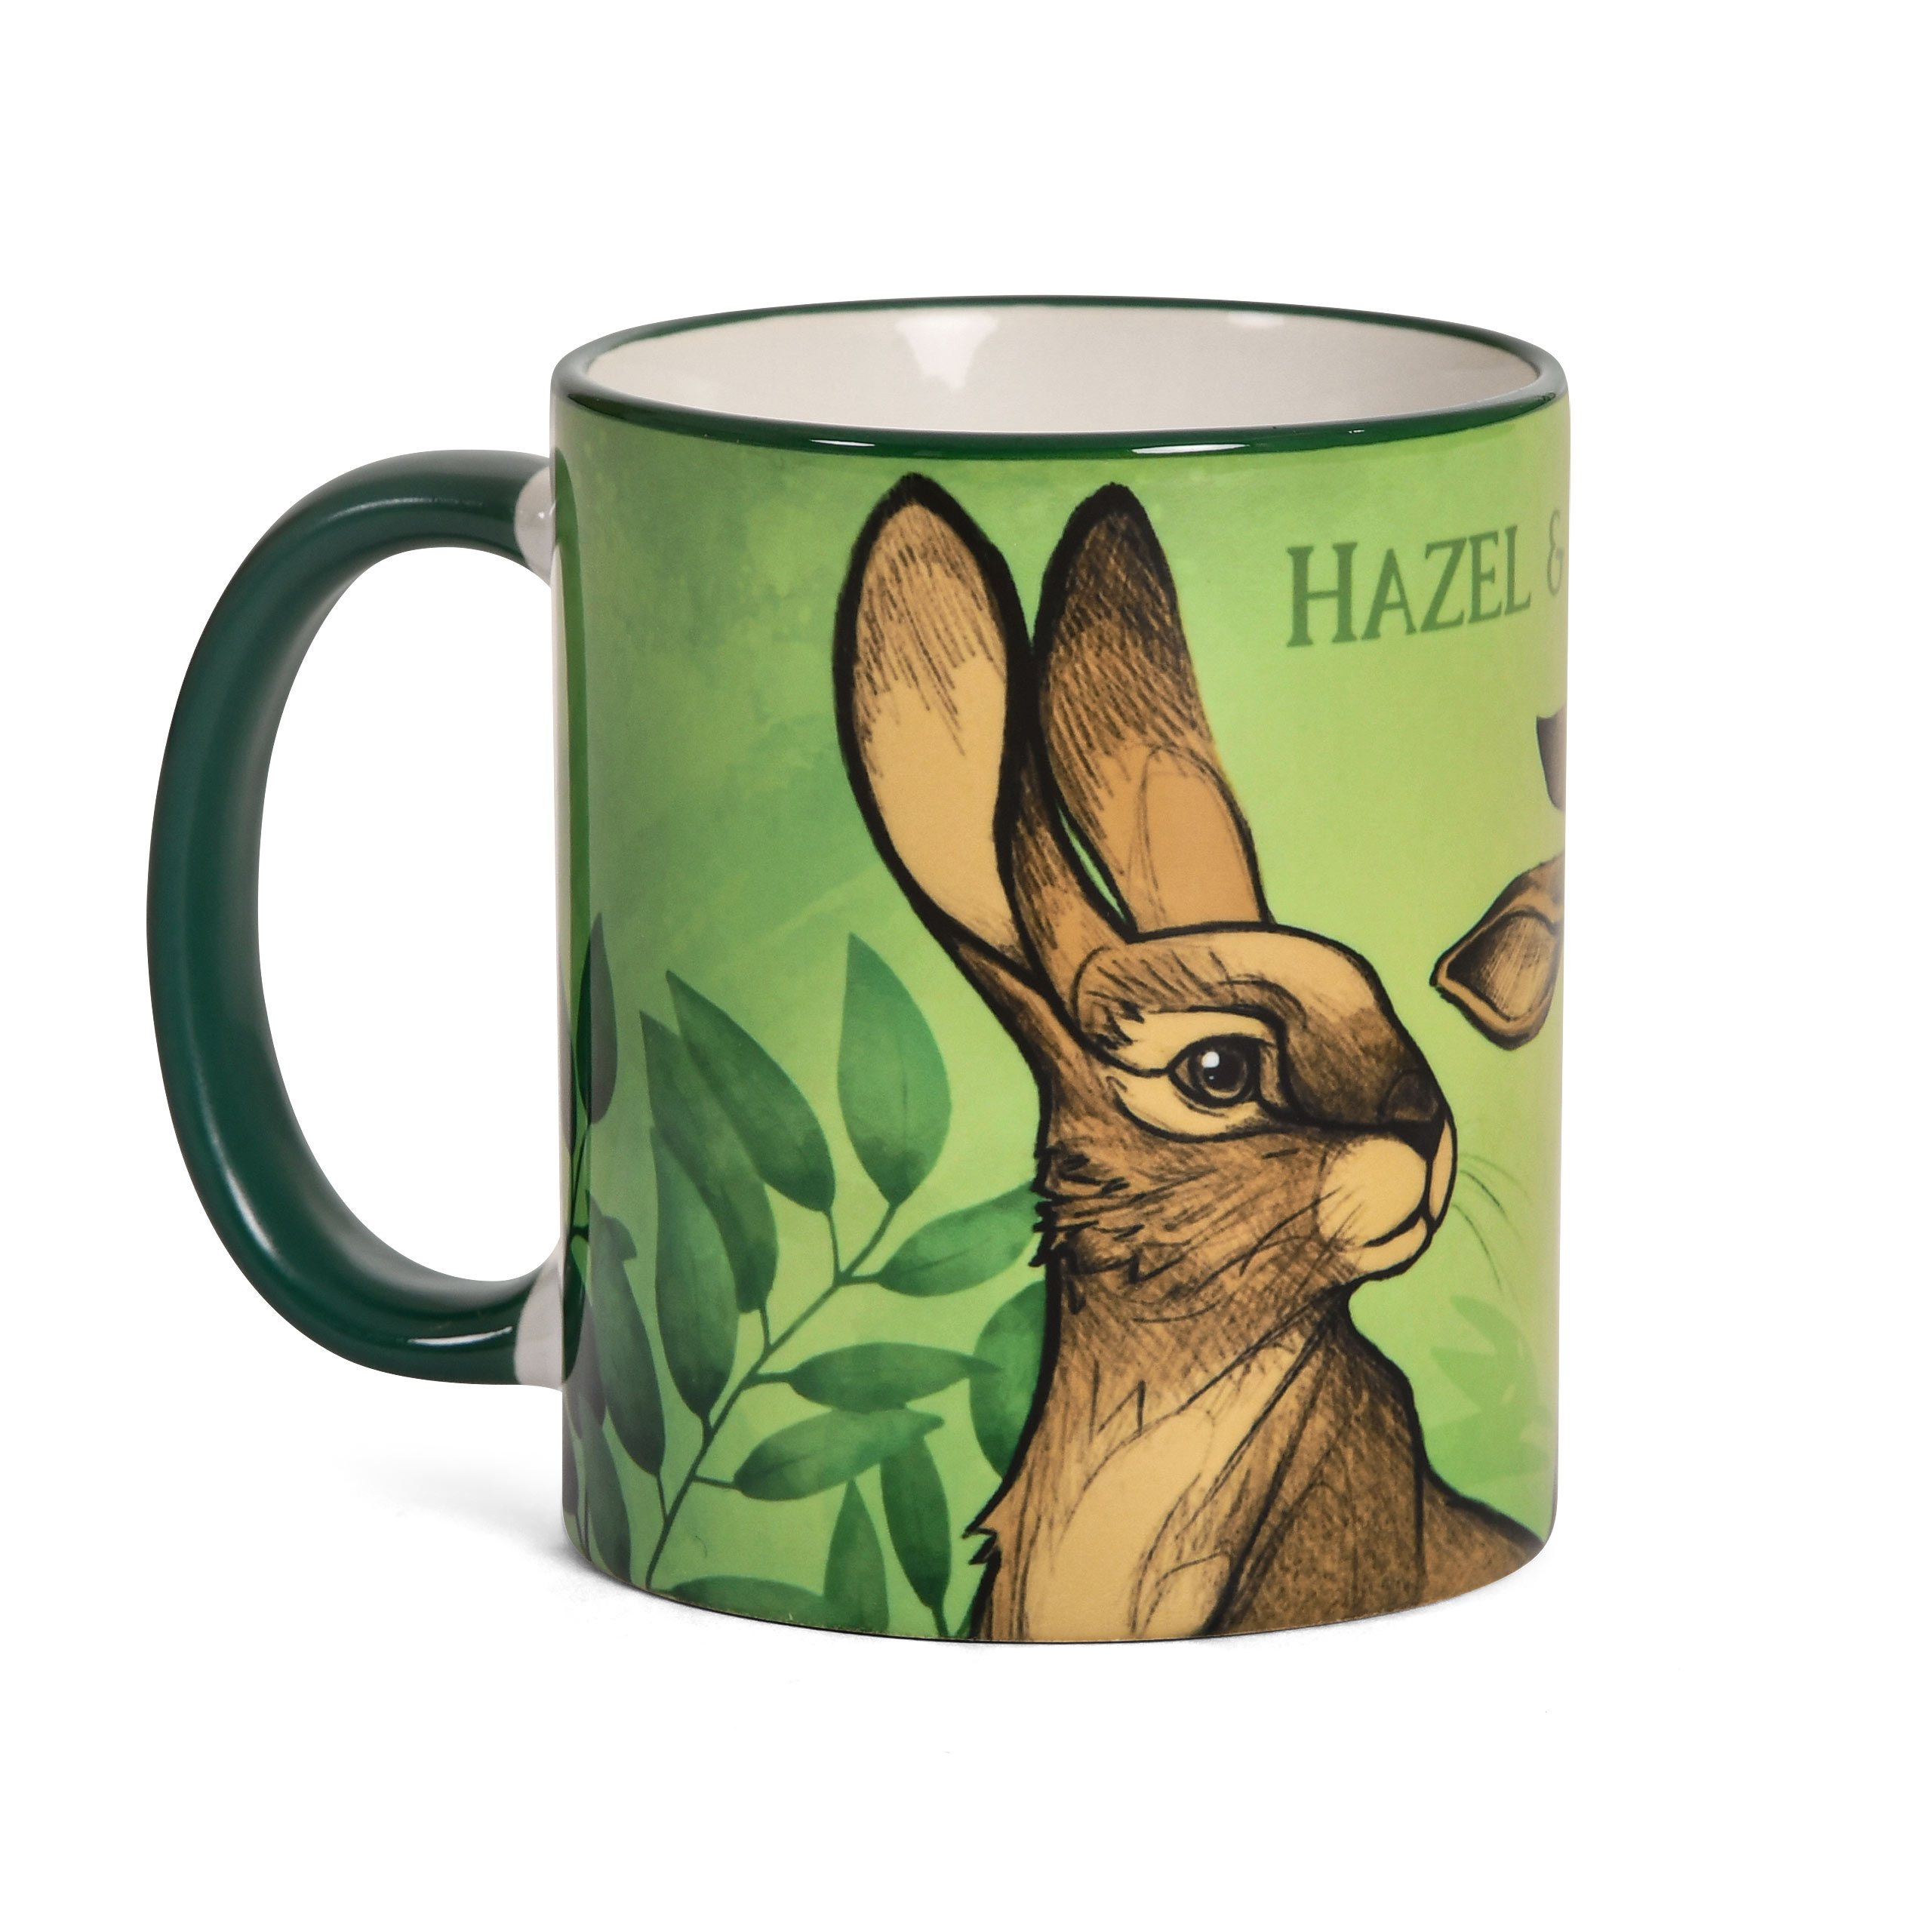 Hazel & Fiver Tasse für Unten am Fluss Fans